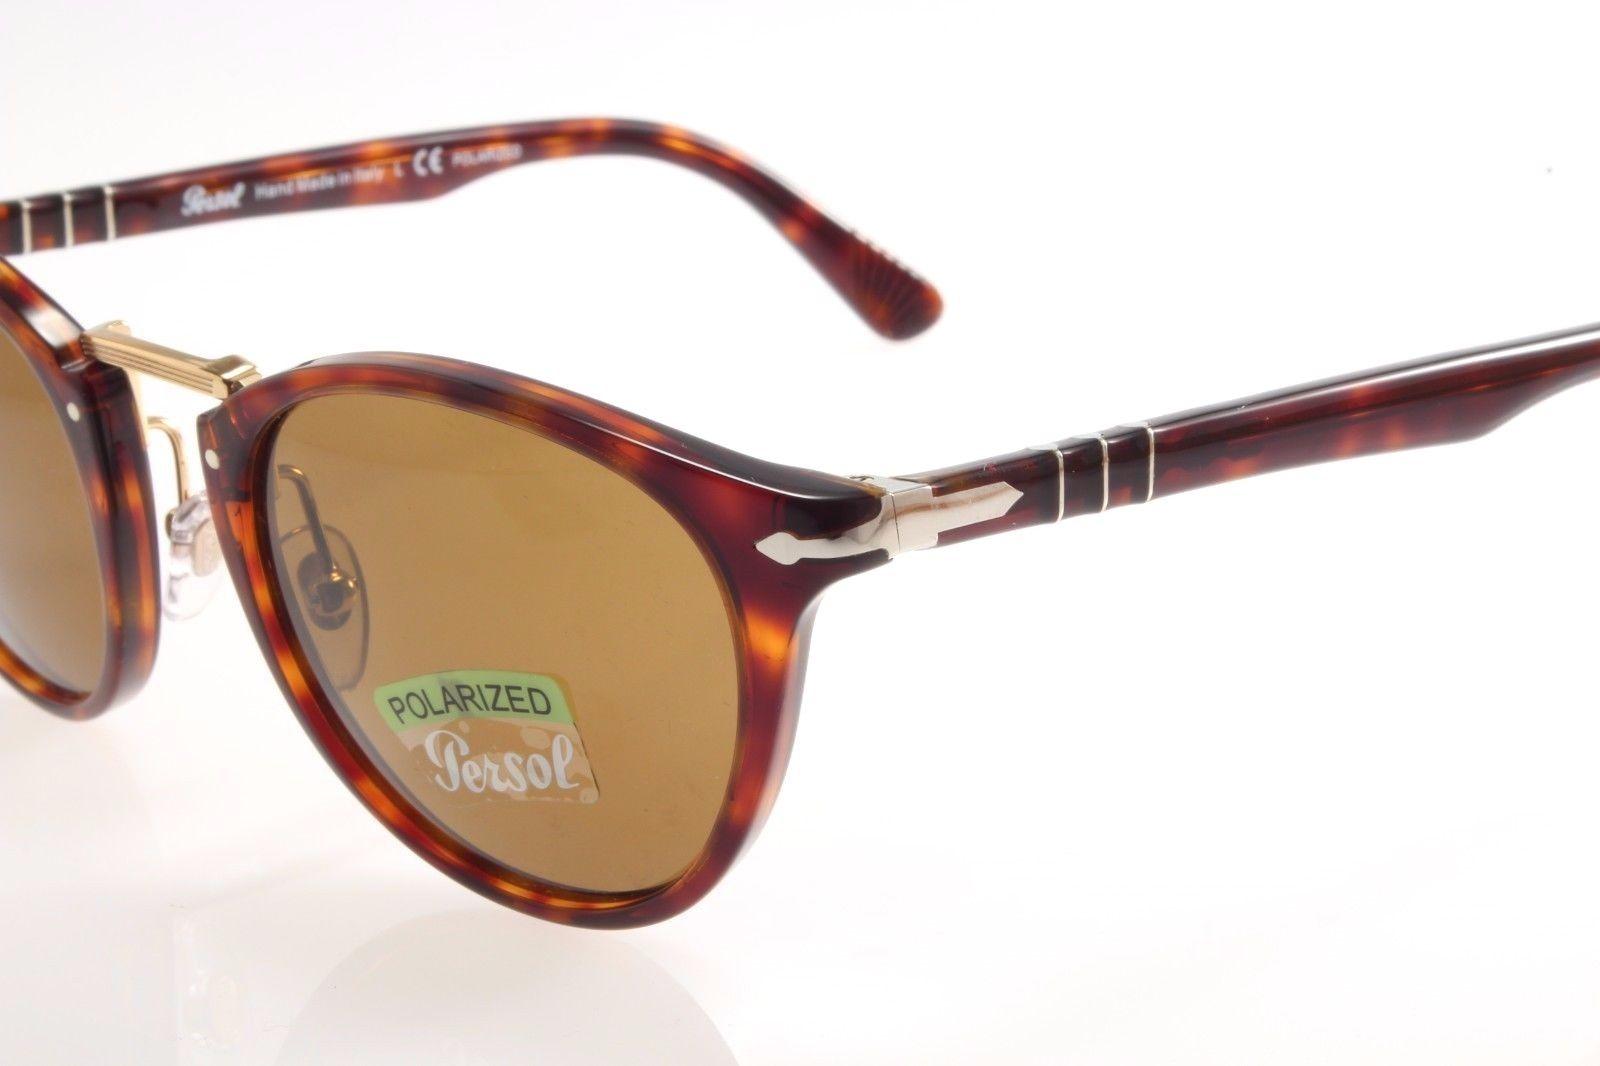 ee2de662c90a New authentic sunglasses Persol Typewriter 3108S 24/57 49 Havana Brown  Polarized